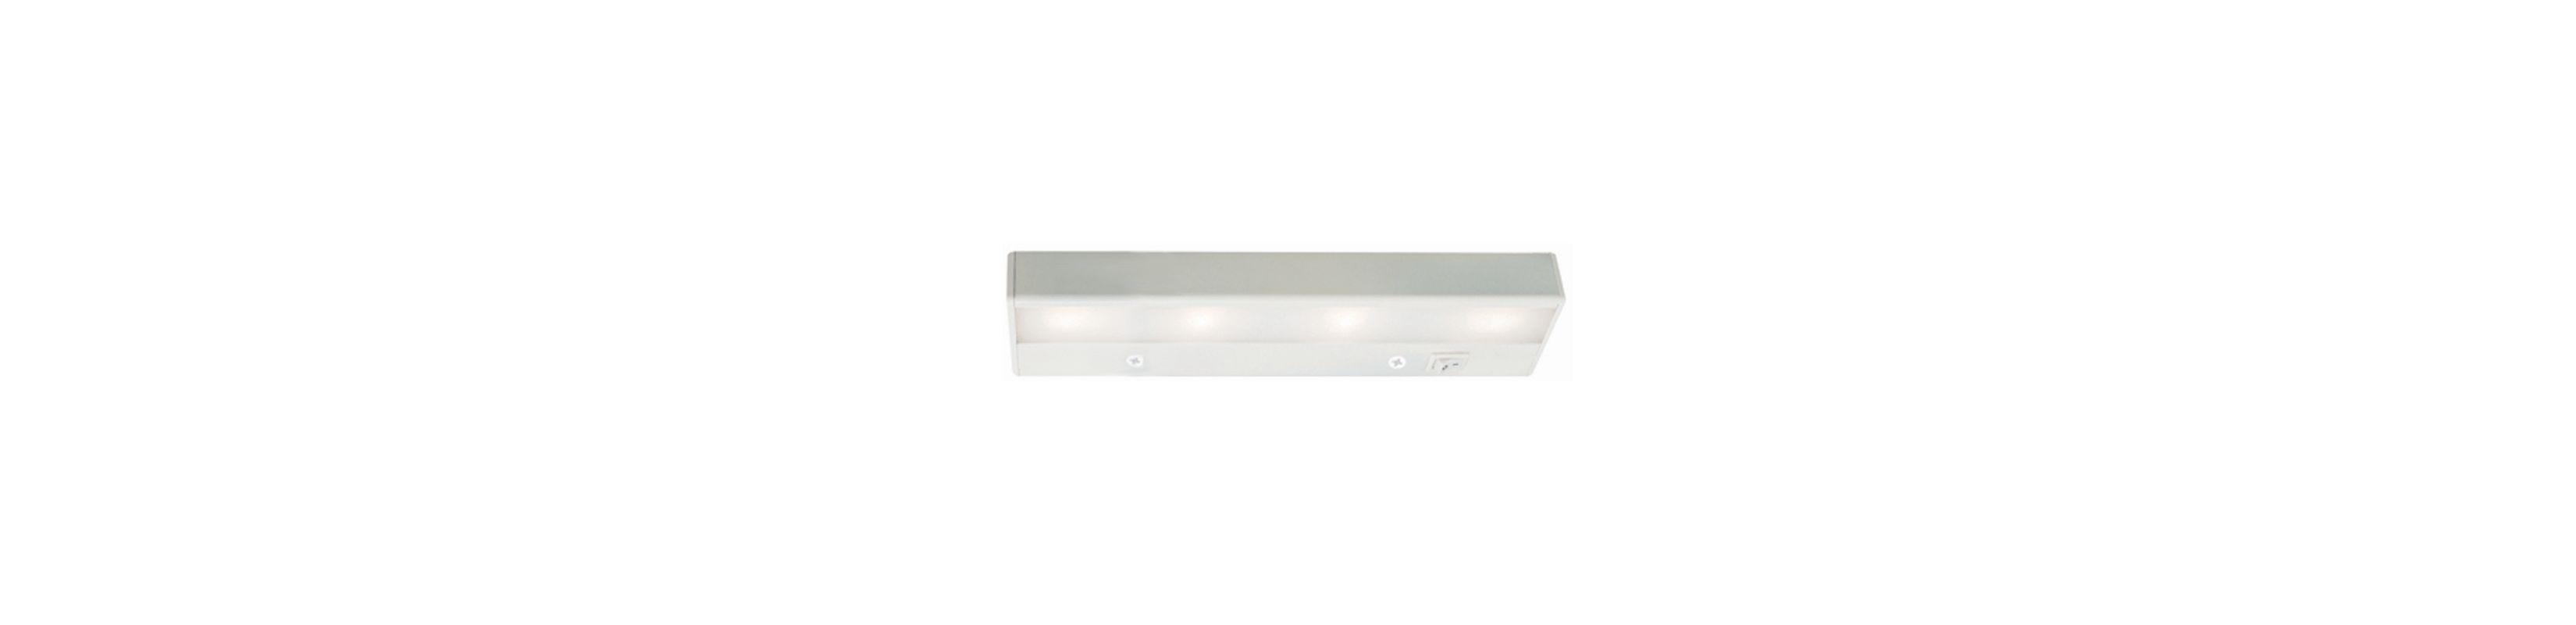 "WAC Lighting BA-LED4-27 12"" Length 2700K High Output LED Under Cabinet"